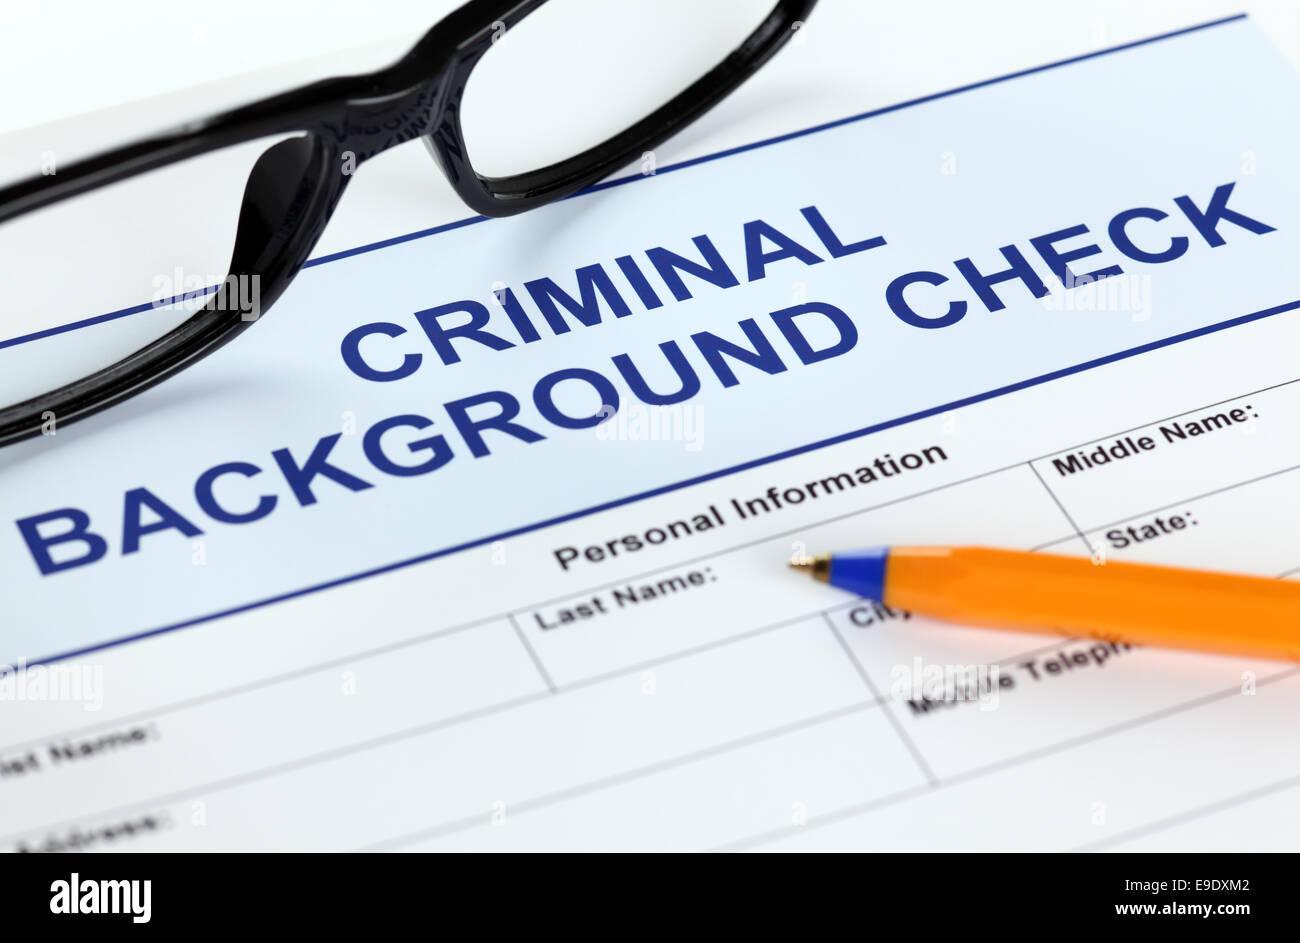 criminal history background check.html